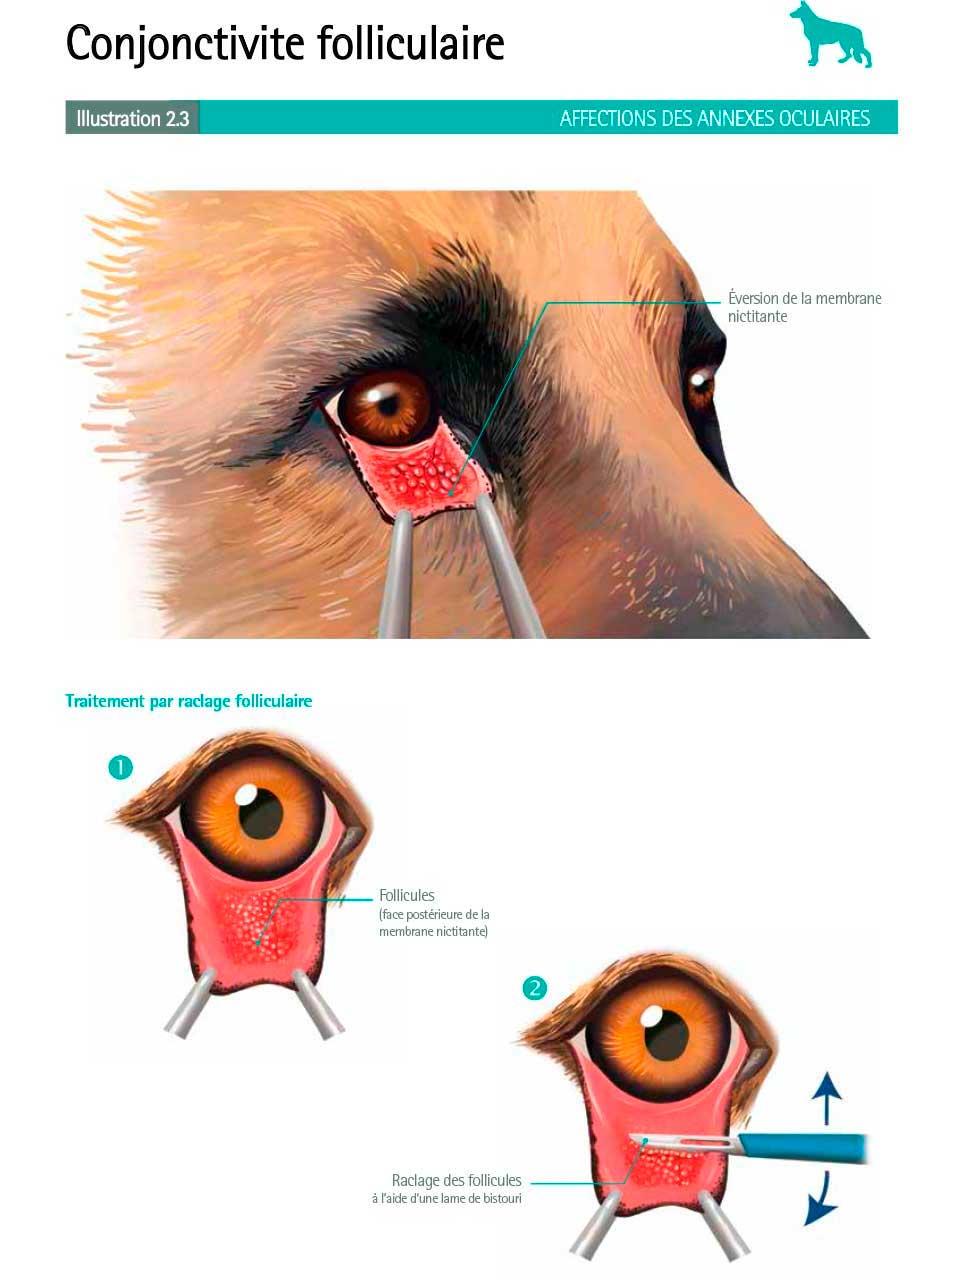 ConjonctiviteFolliculaire